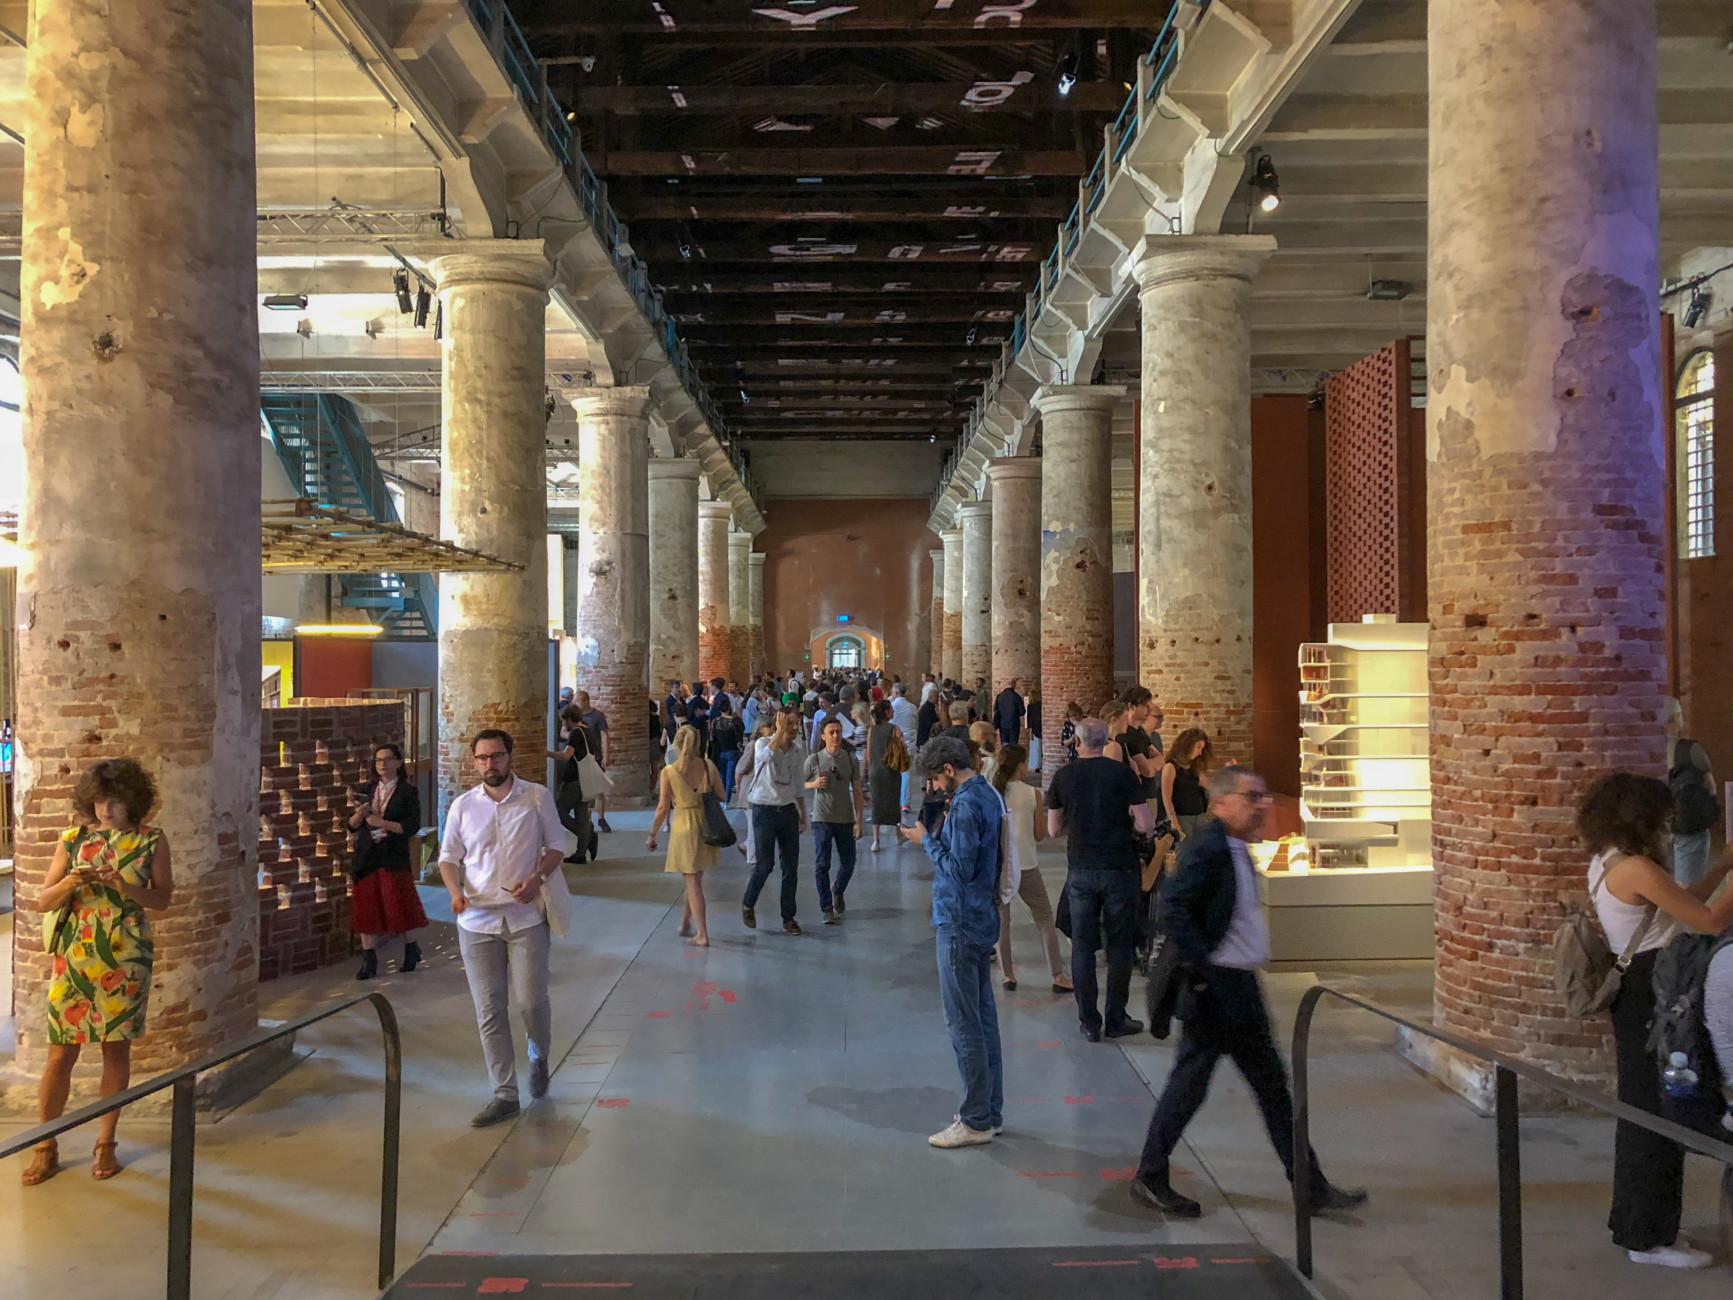 Biennale 2018, Arsenale, Corderie, Central Corridor, Stylepark